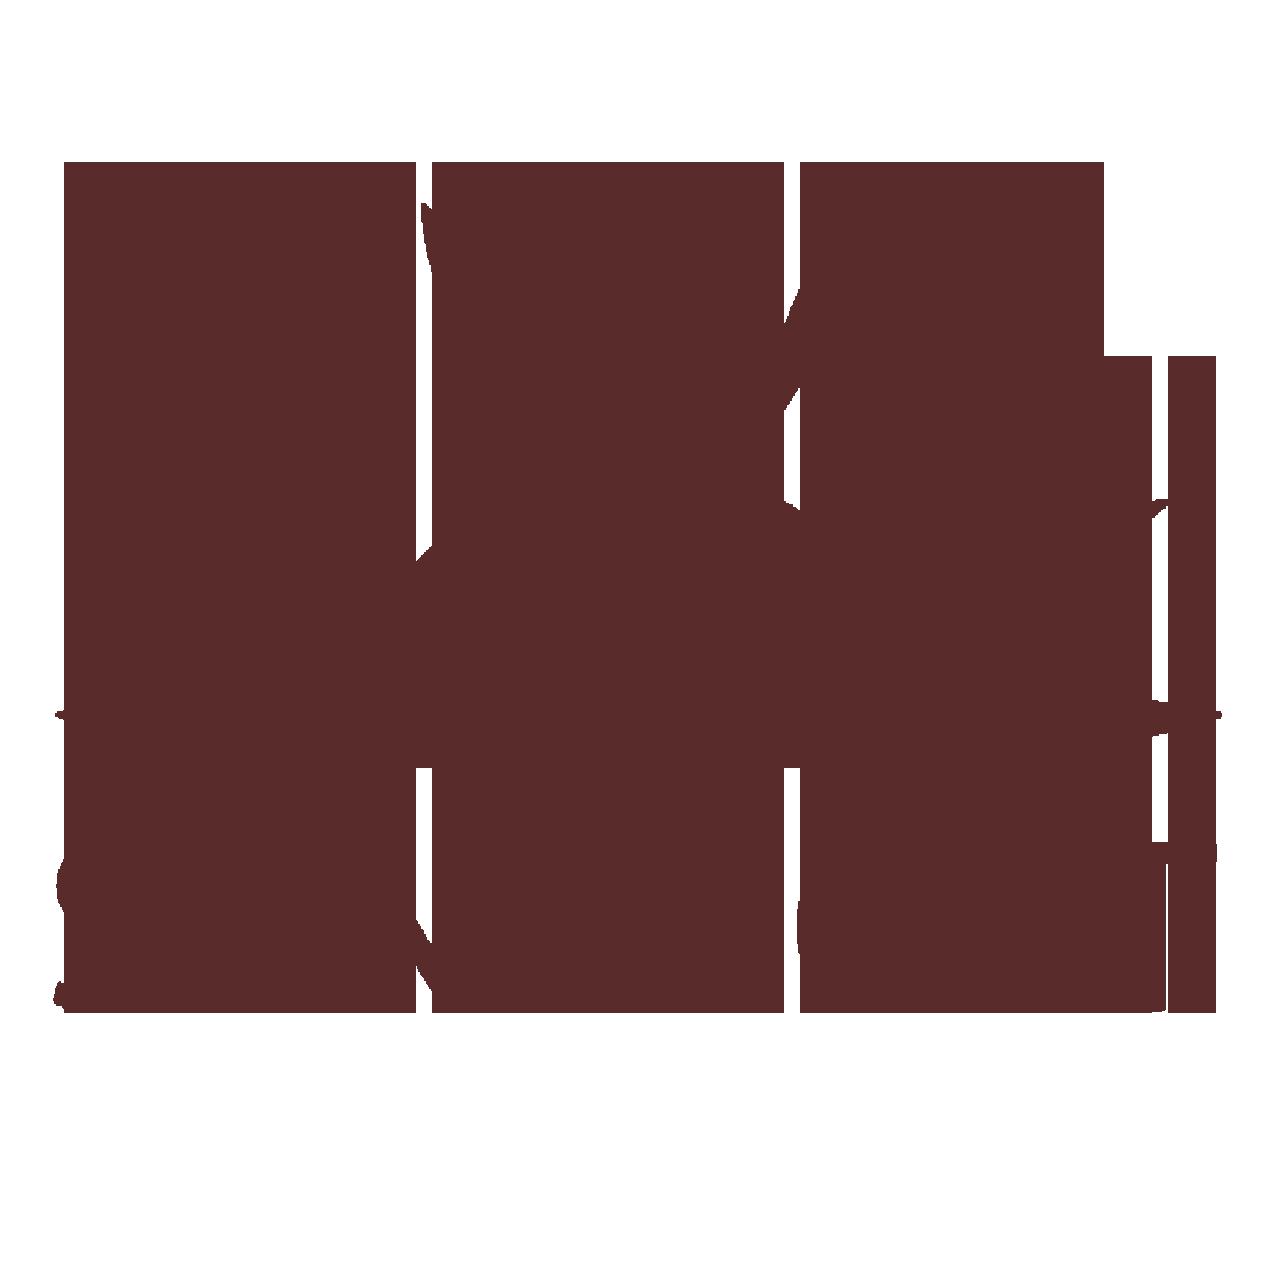 تولیدی کفش سان اسپورت - sun sport